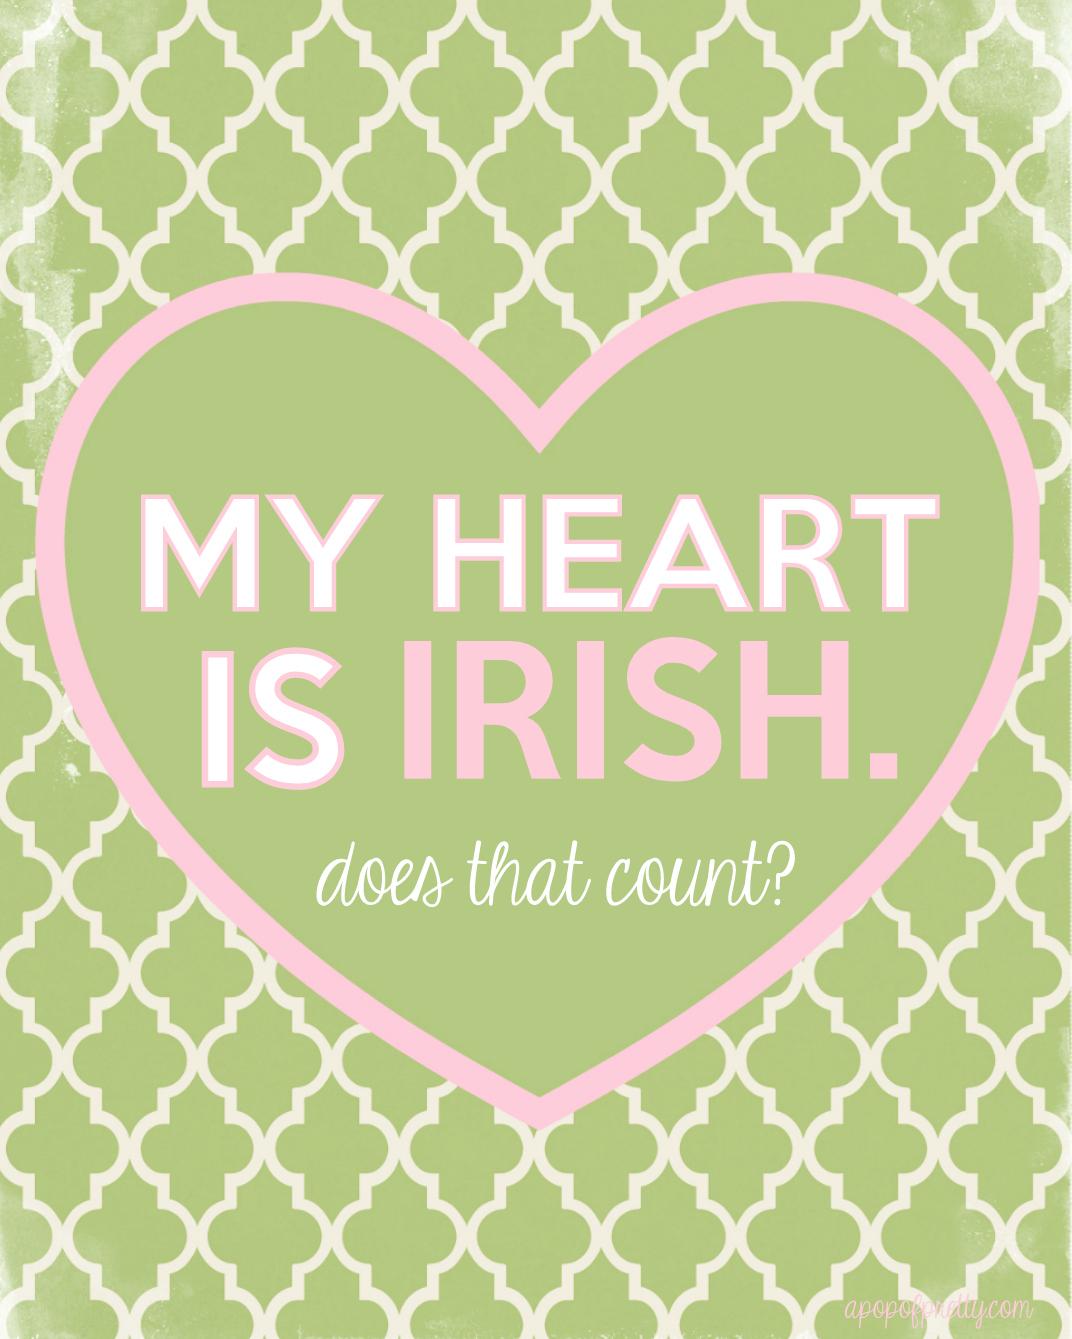 St Patricks Day Printable - my heart is Irish